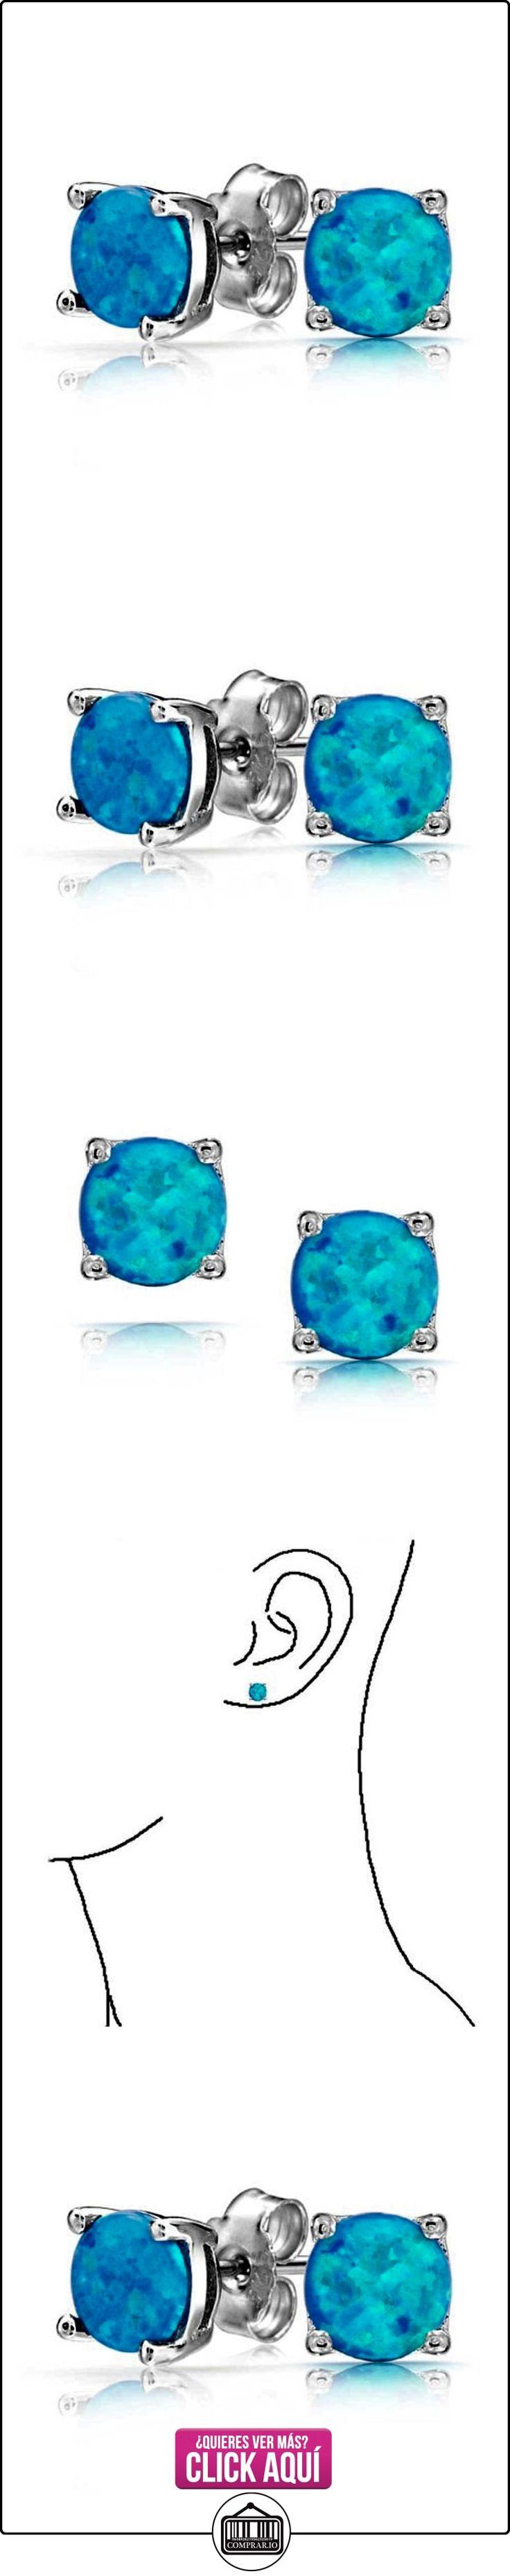 Bling Jewelry Plata Esterlina Ópalo azul redonda Ceta stud Arete 6mm  ✿ Joyas para mujer - Las mejores ofertas ✿ ▬► Ver oferta: https://comprar.io/goto/B009NEQK5S